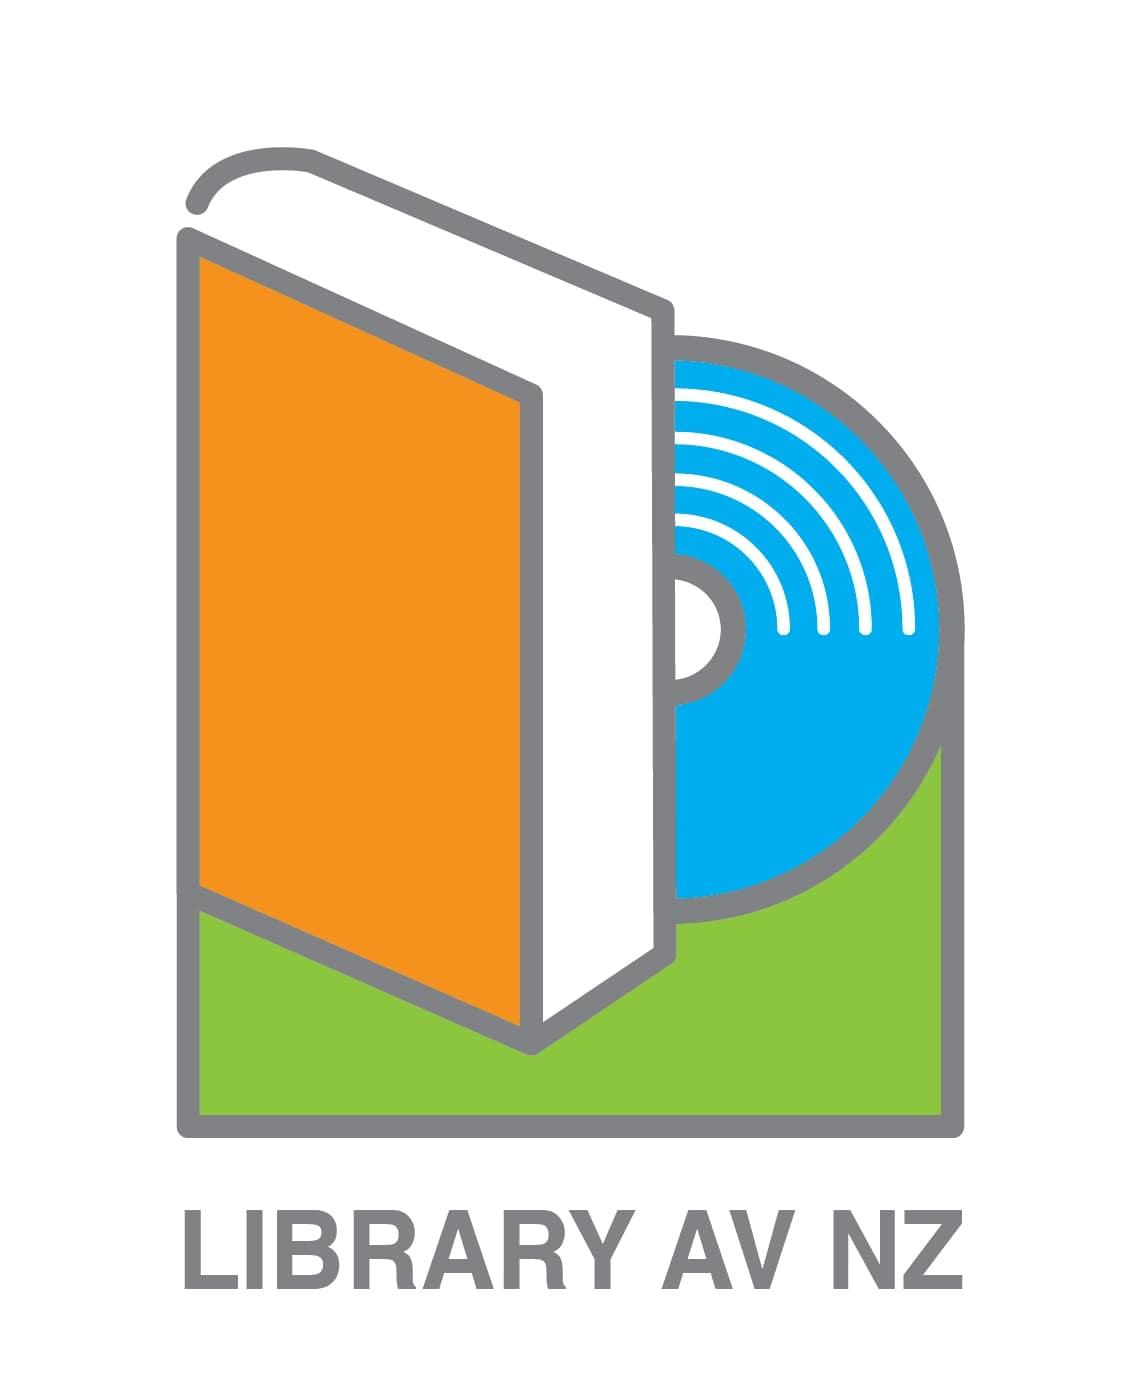 LibraryAVNZ Large colour